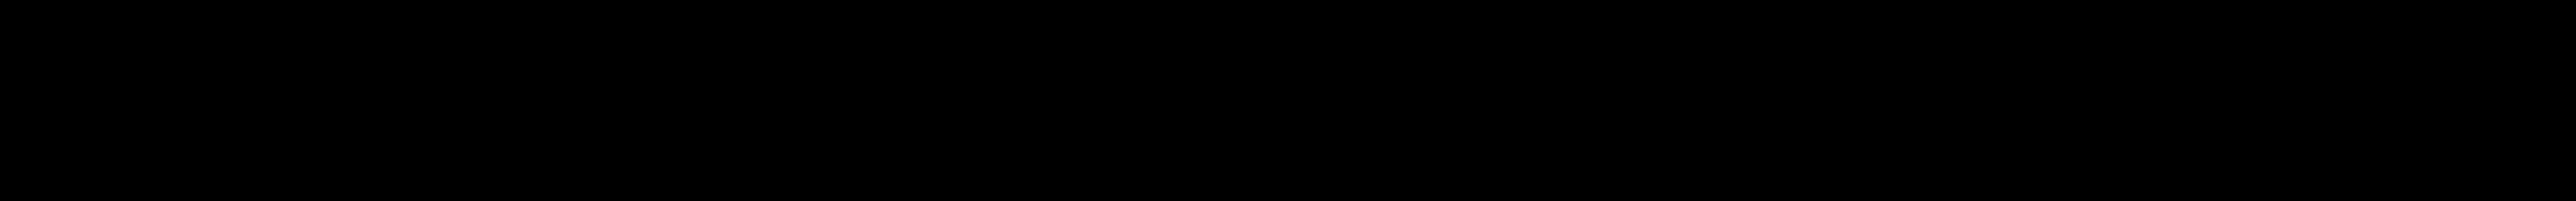 محاسبه مول آب